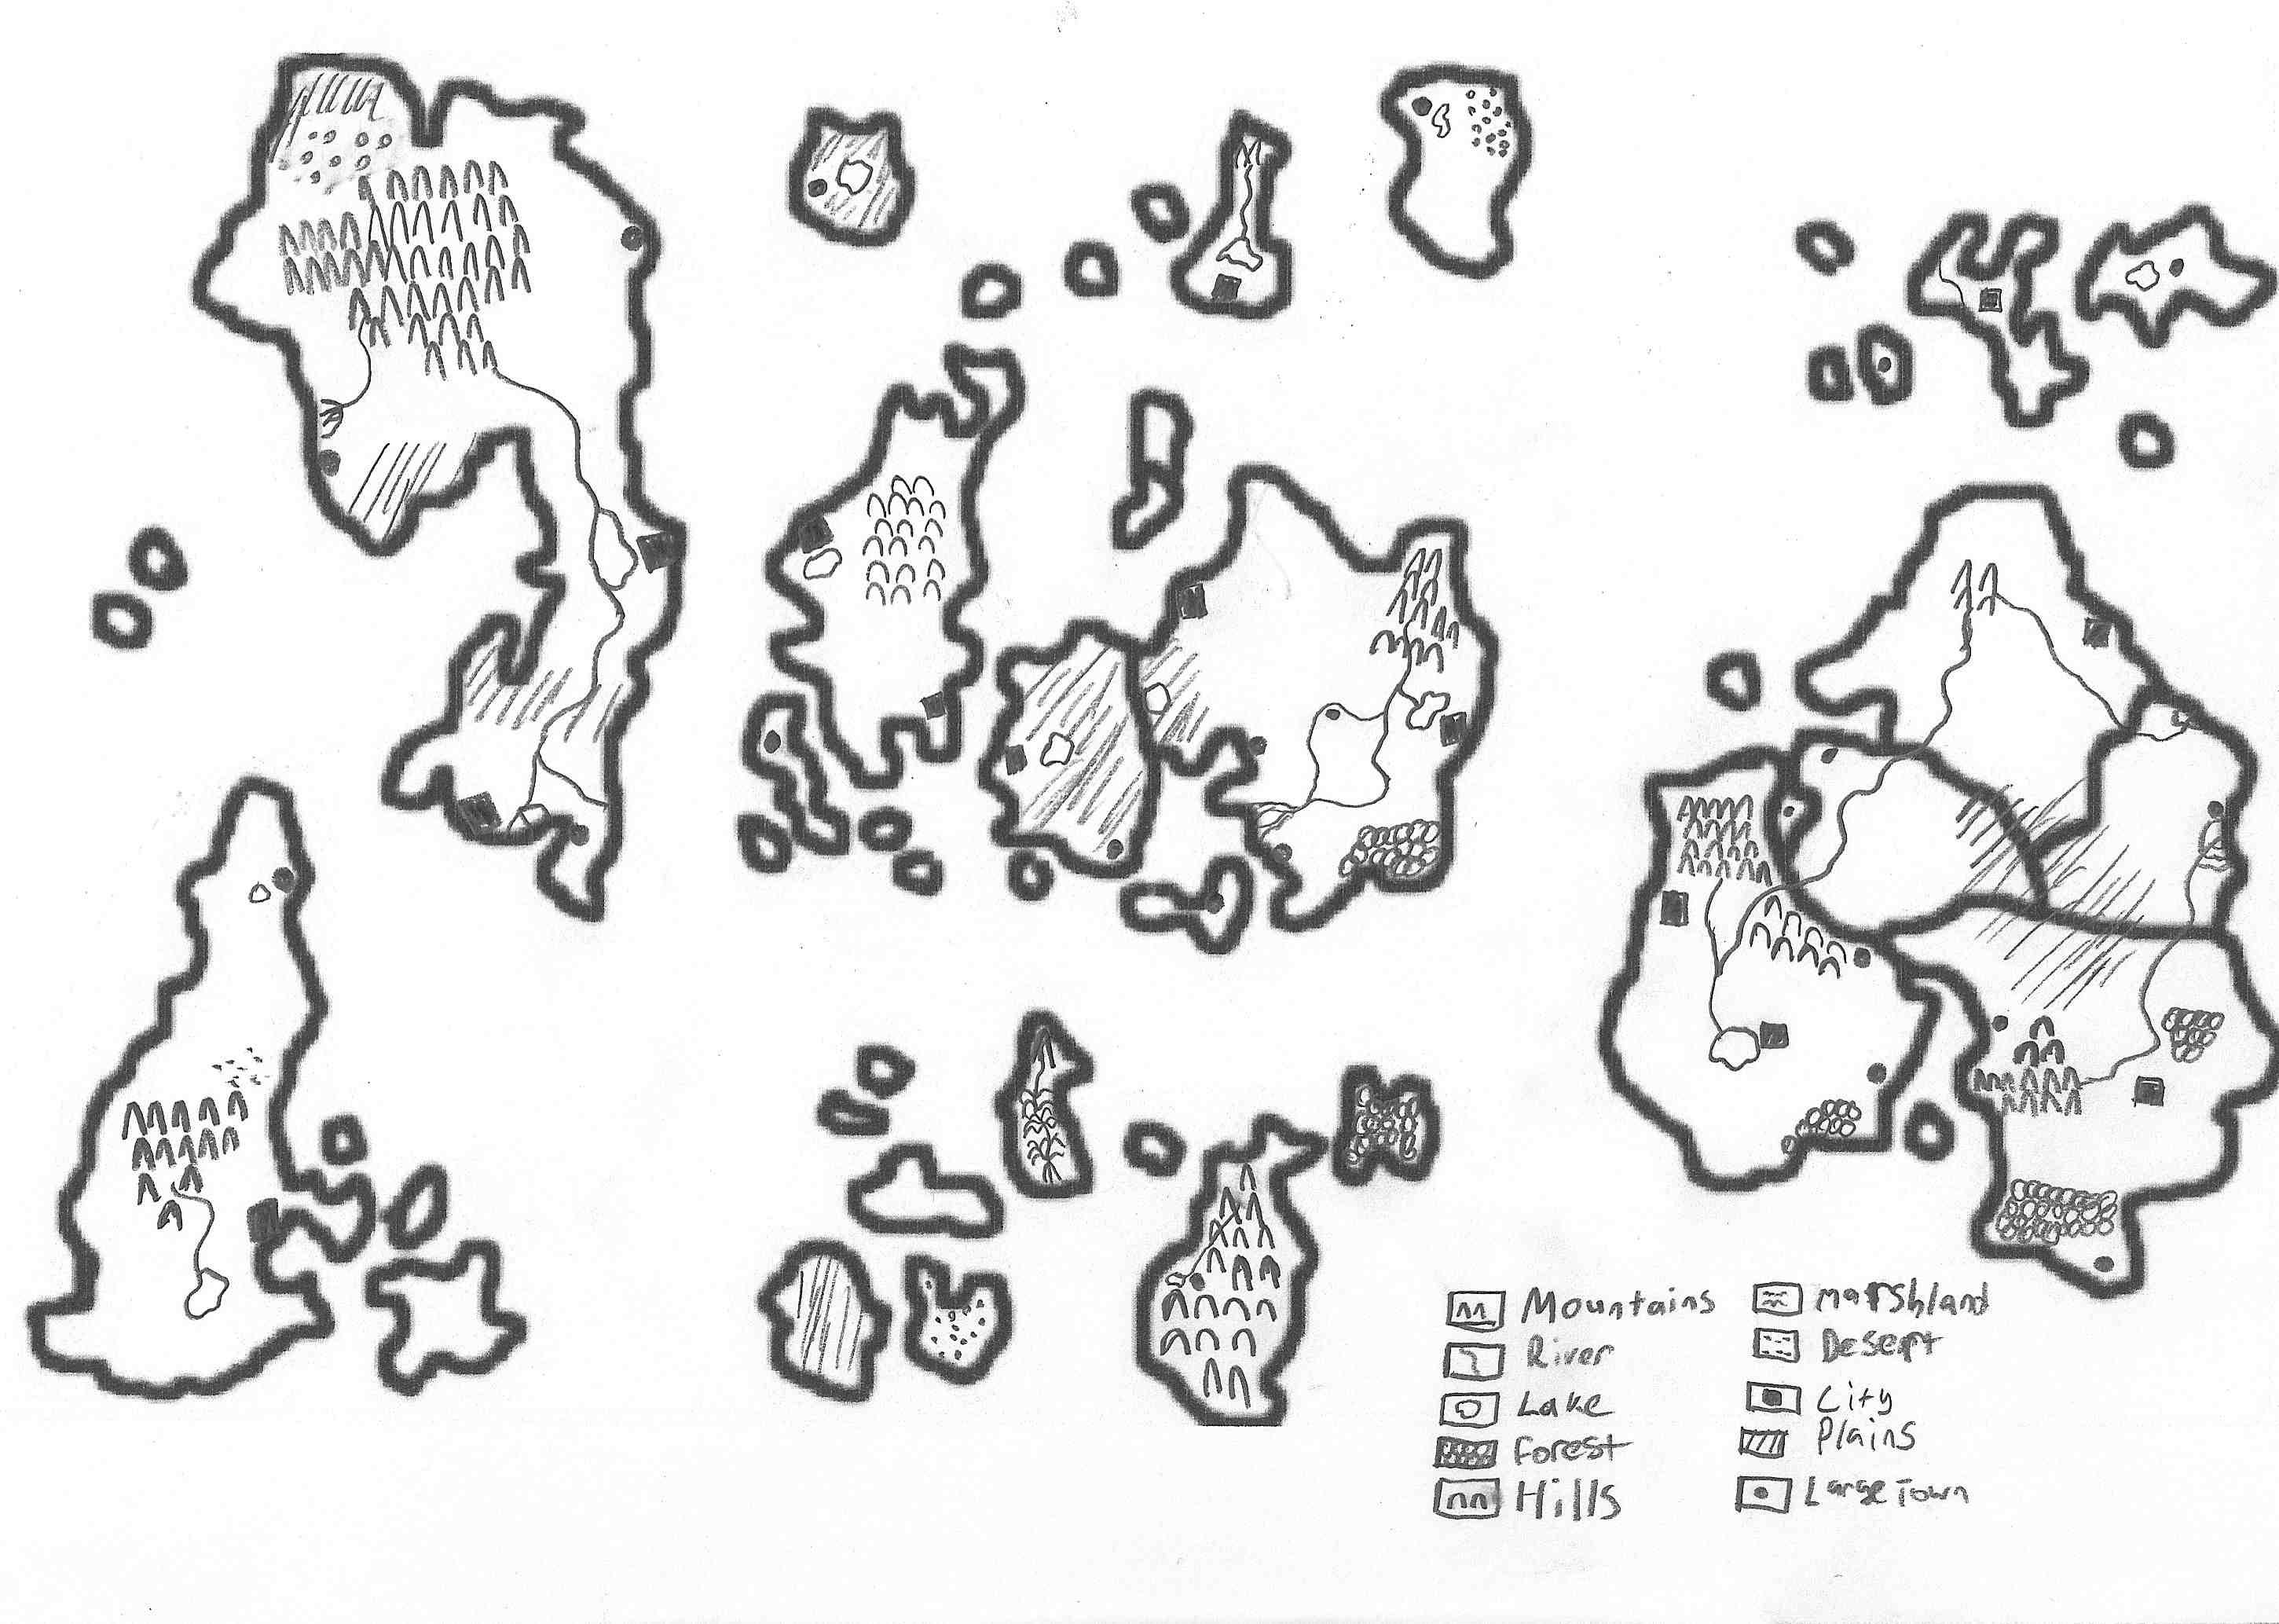 Regnes geographic map2